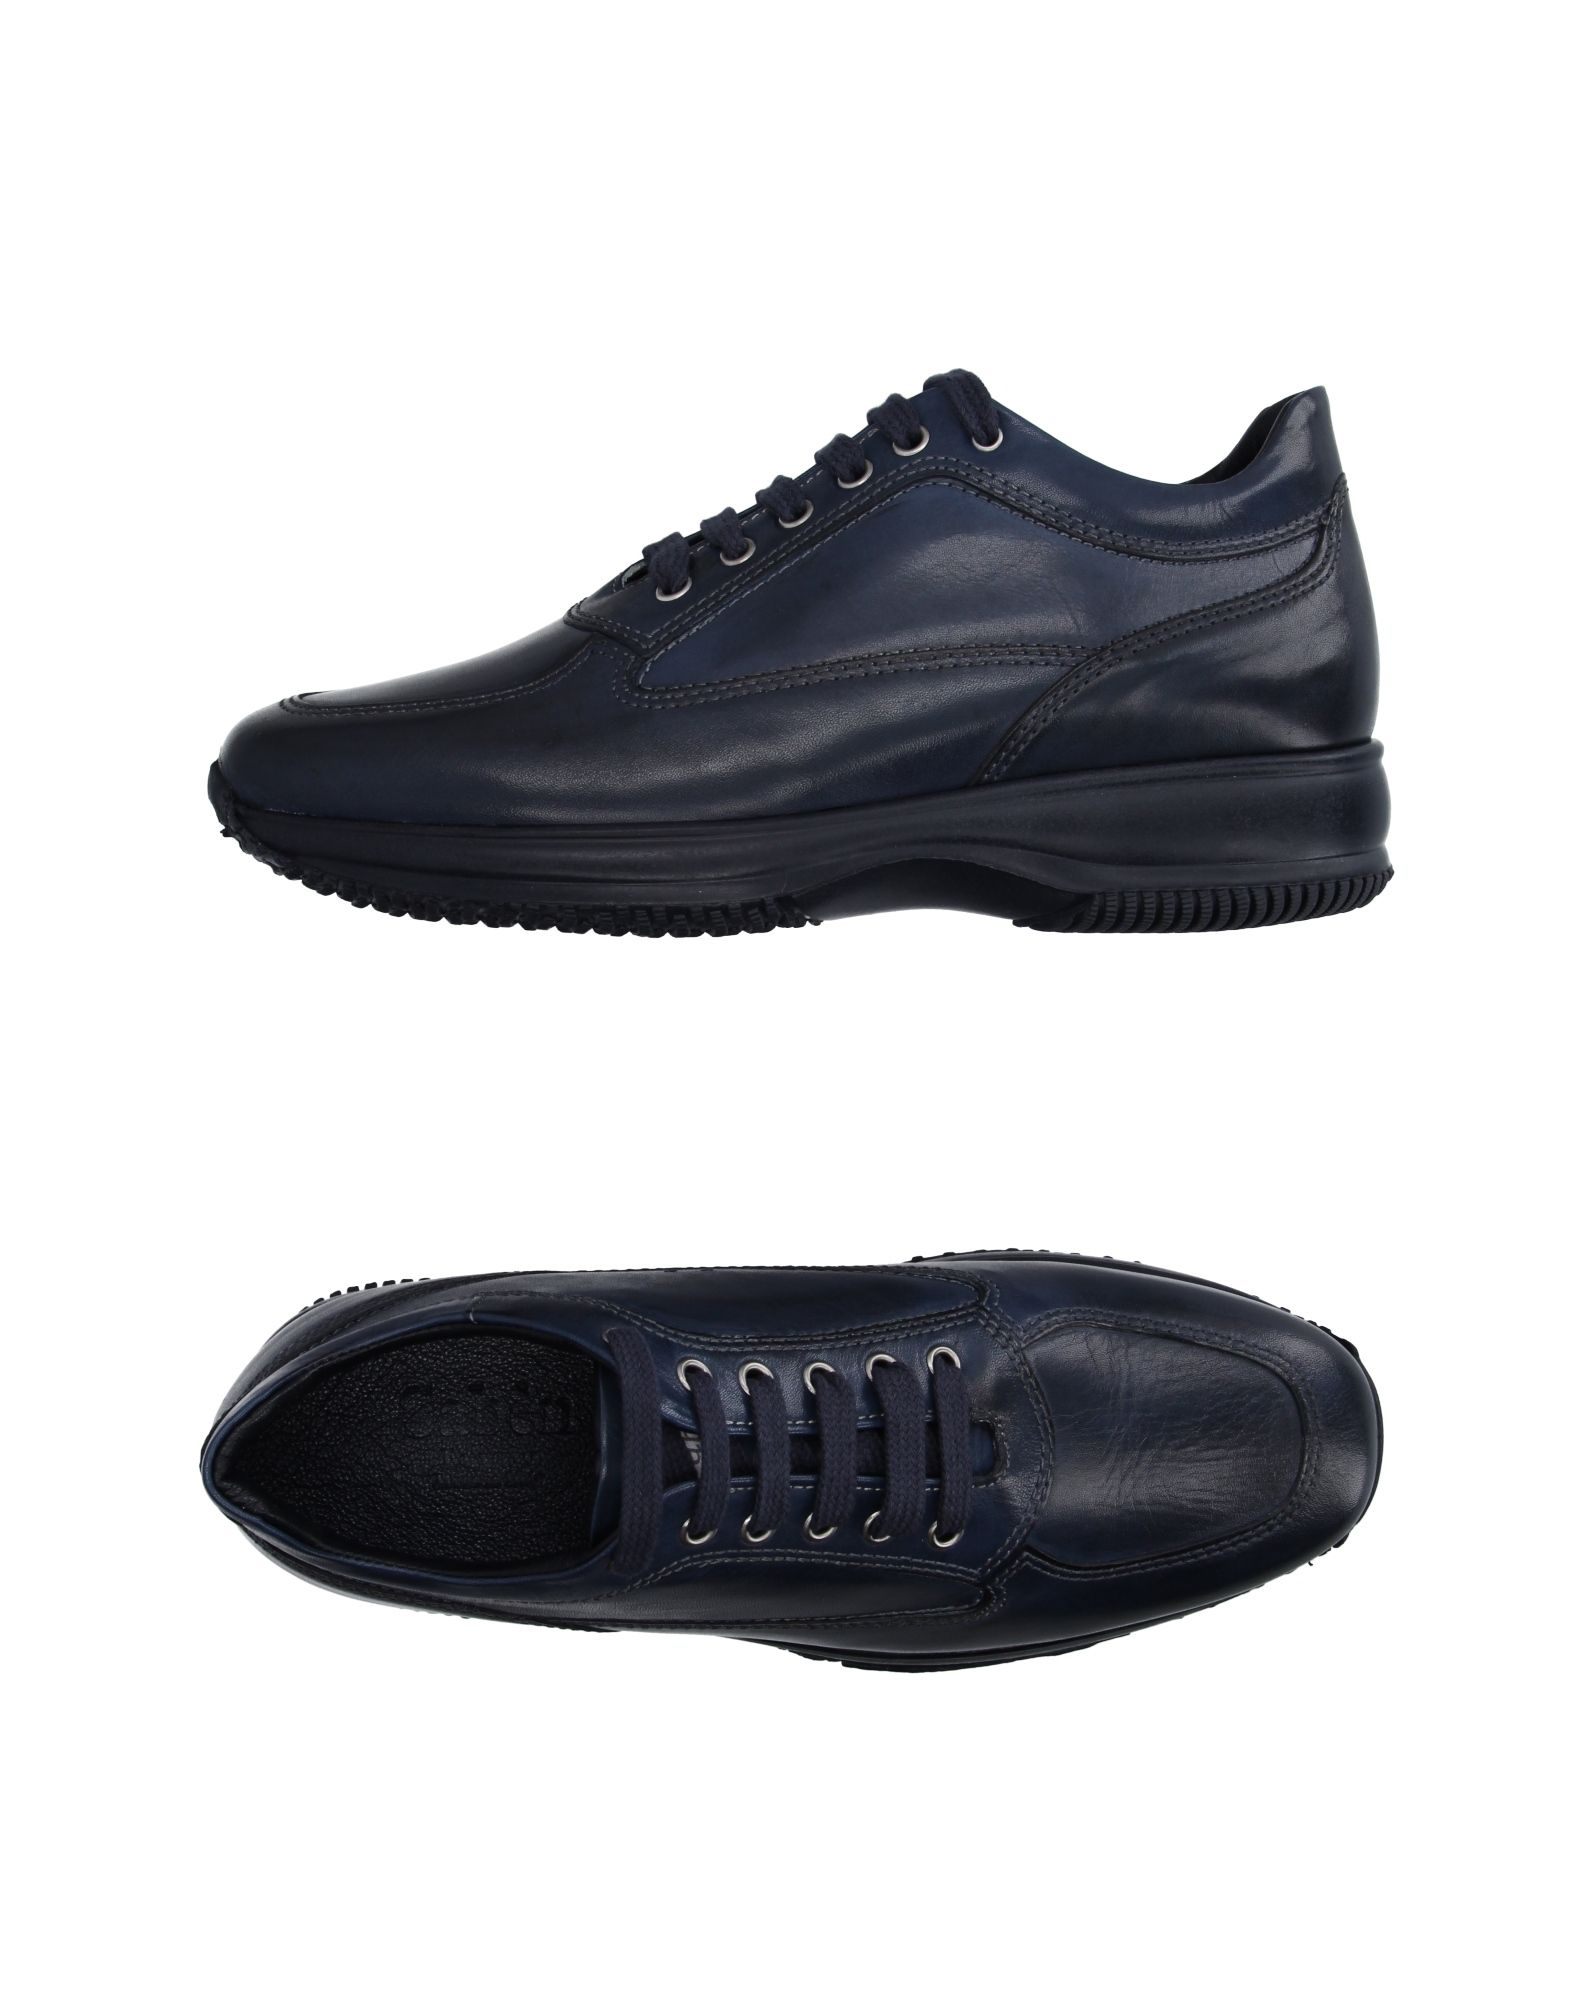 Sabèn Shoes Sneakers - Men Sabèn  Shoes Sneakers online on  Sabèn United Kingdom - 11102338VF 1c142a